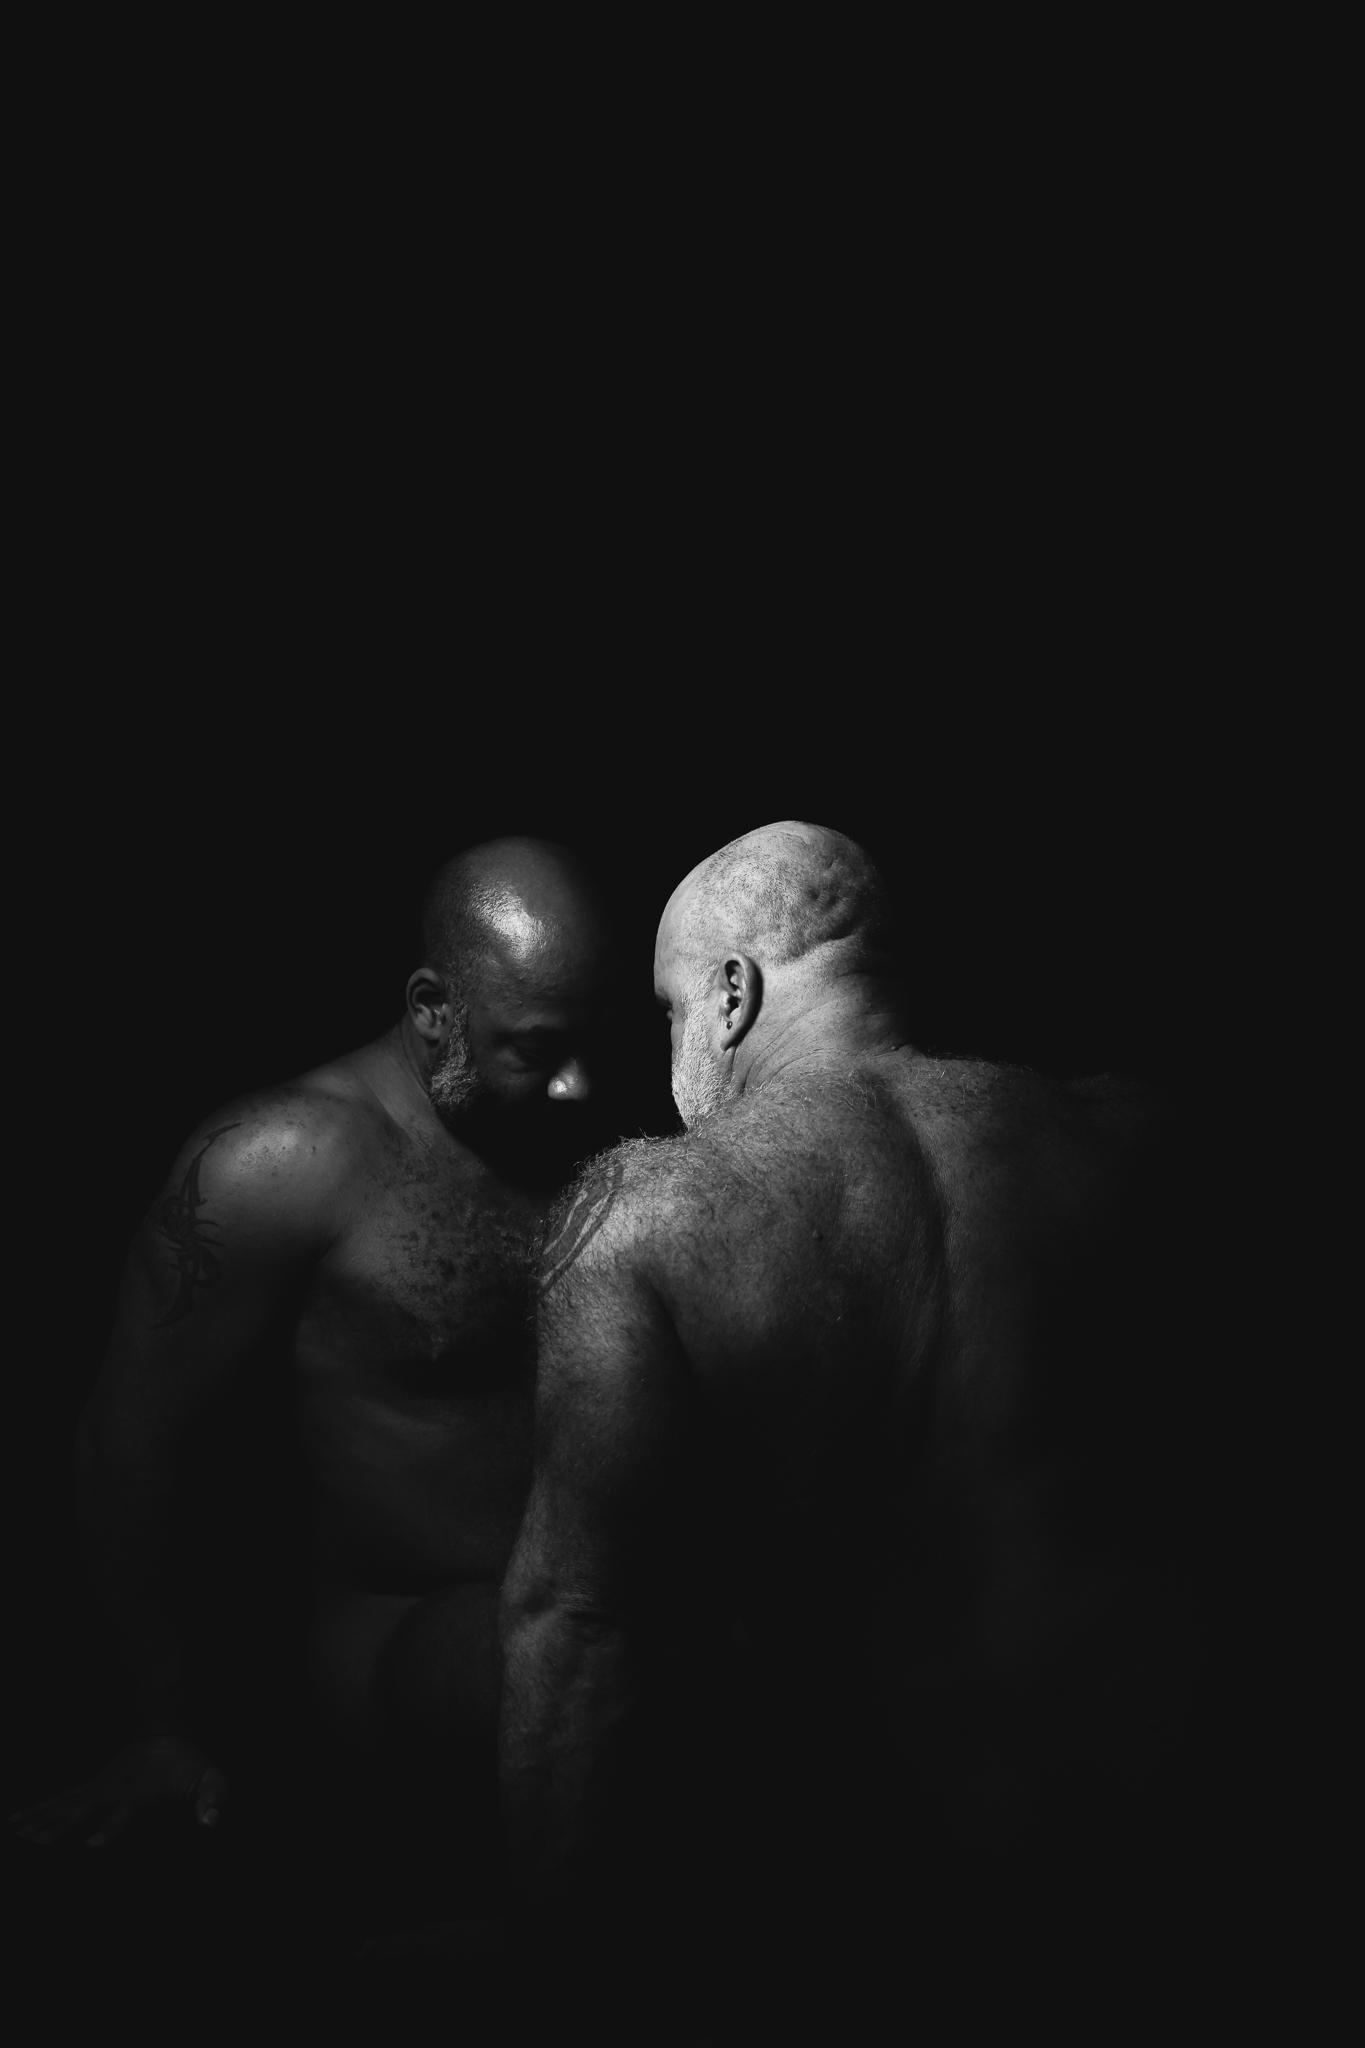 Sexy Sunday Photography Book-20161108-untitled-2042011.jpg